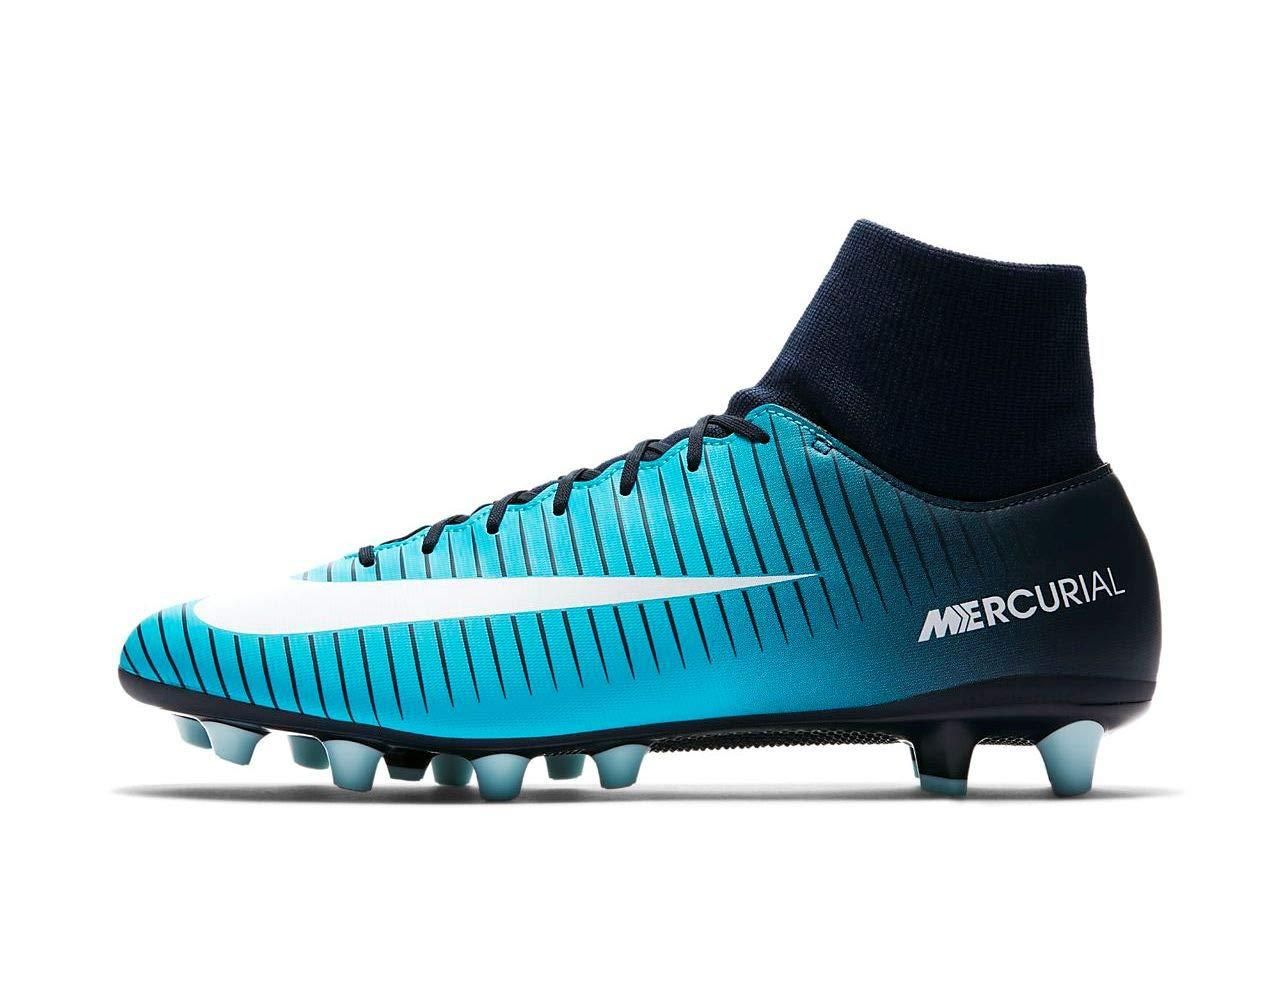 903608-404 Nike Men's Mercurial Victory VI DF (AG-Pro) Fussballschuh Herren [GR 41 US 8]